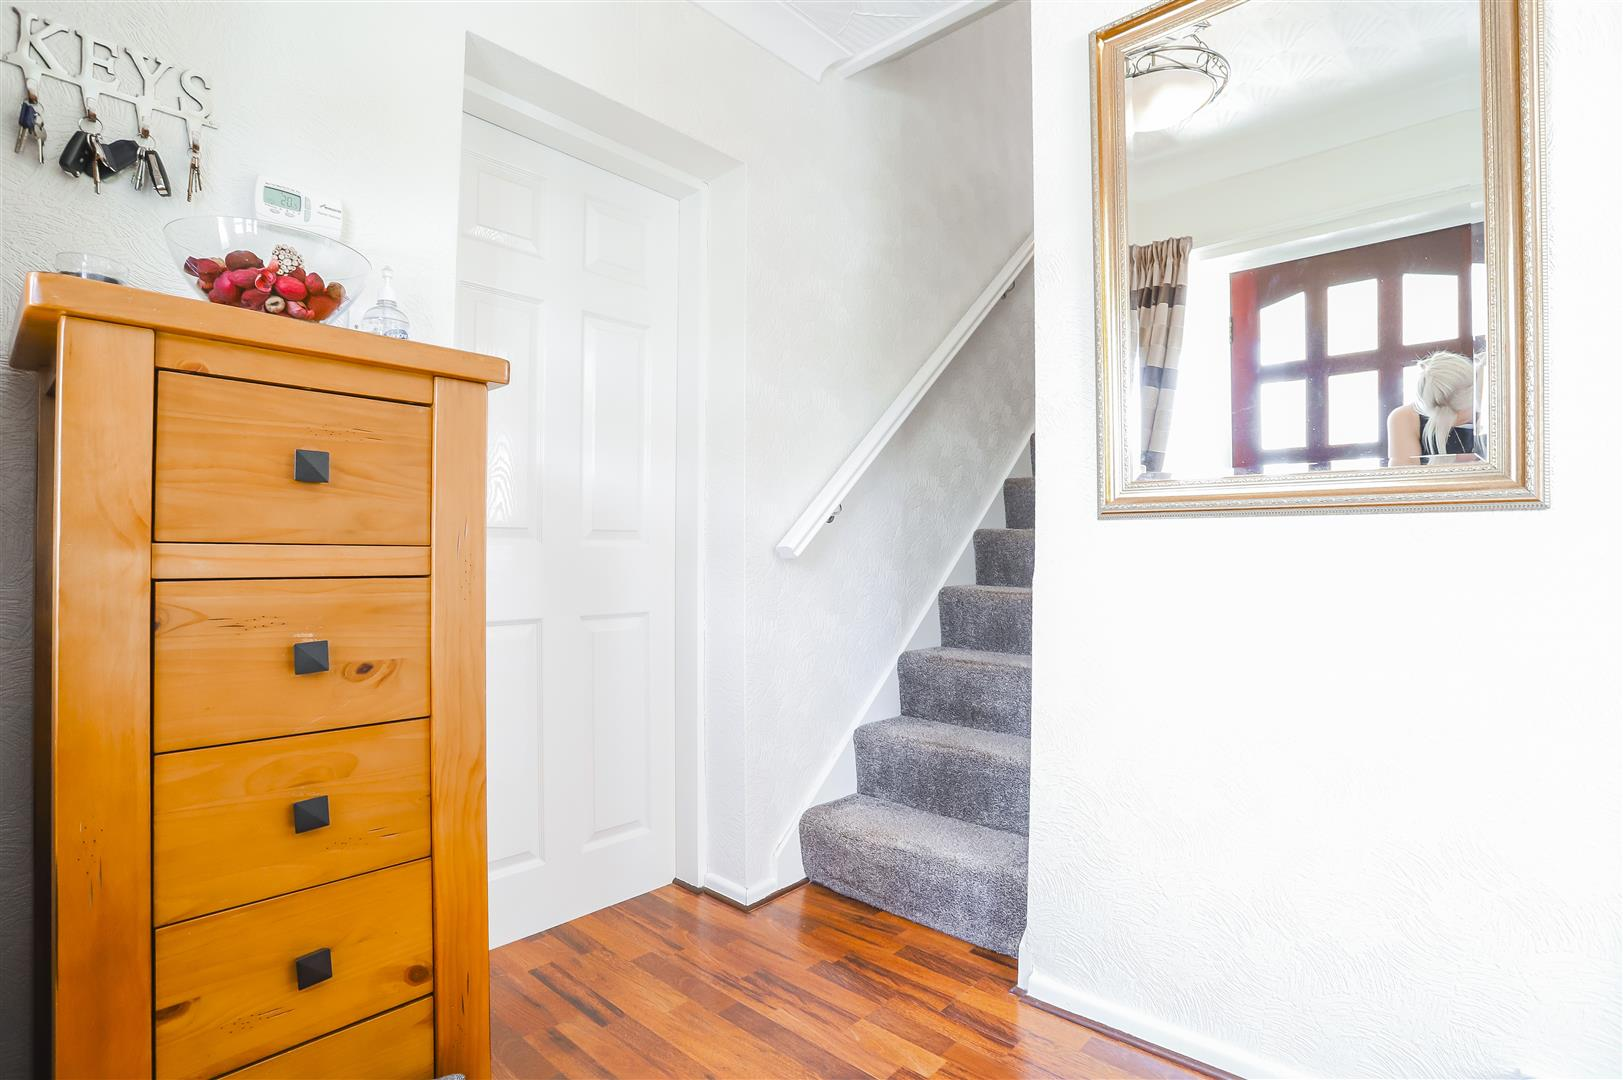 4 Bedroom Semi-detached House For Sale - Image 22